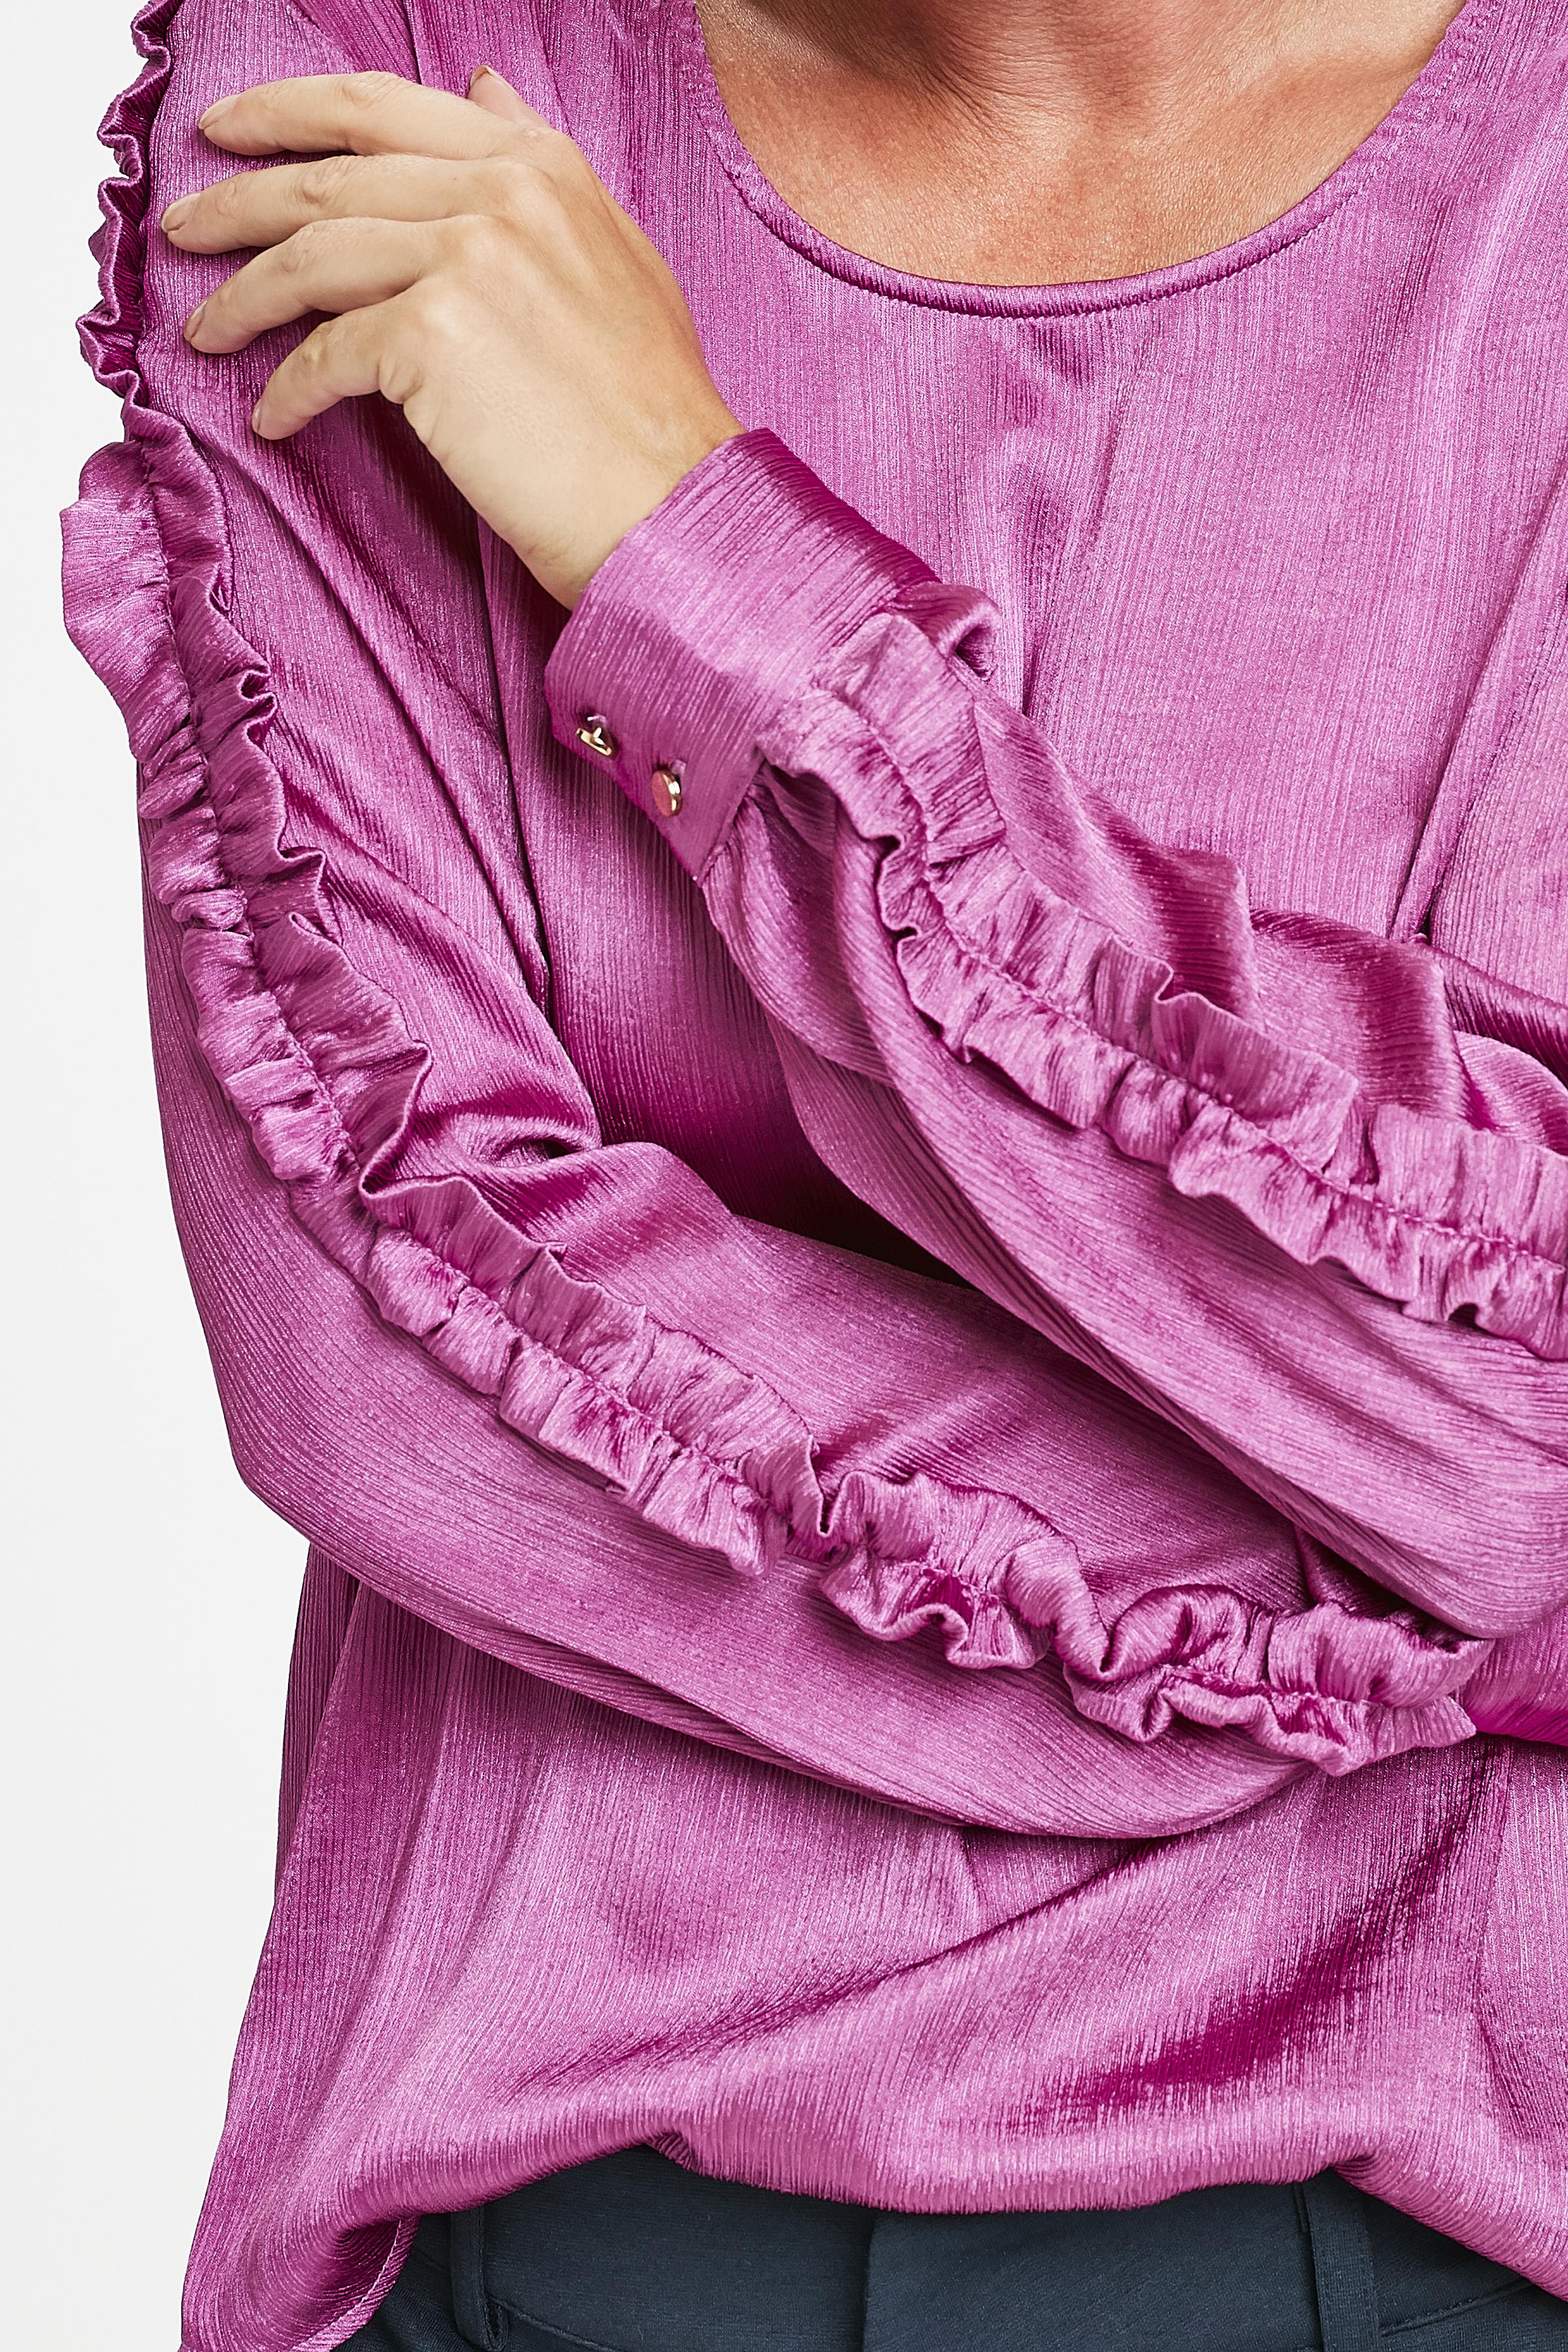 Pink Langarm-Bluse von Kaffe – Shoppen SiePink Langarm-Bluse ab Gr. 34-46 hier